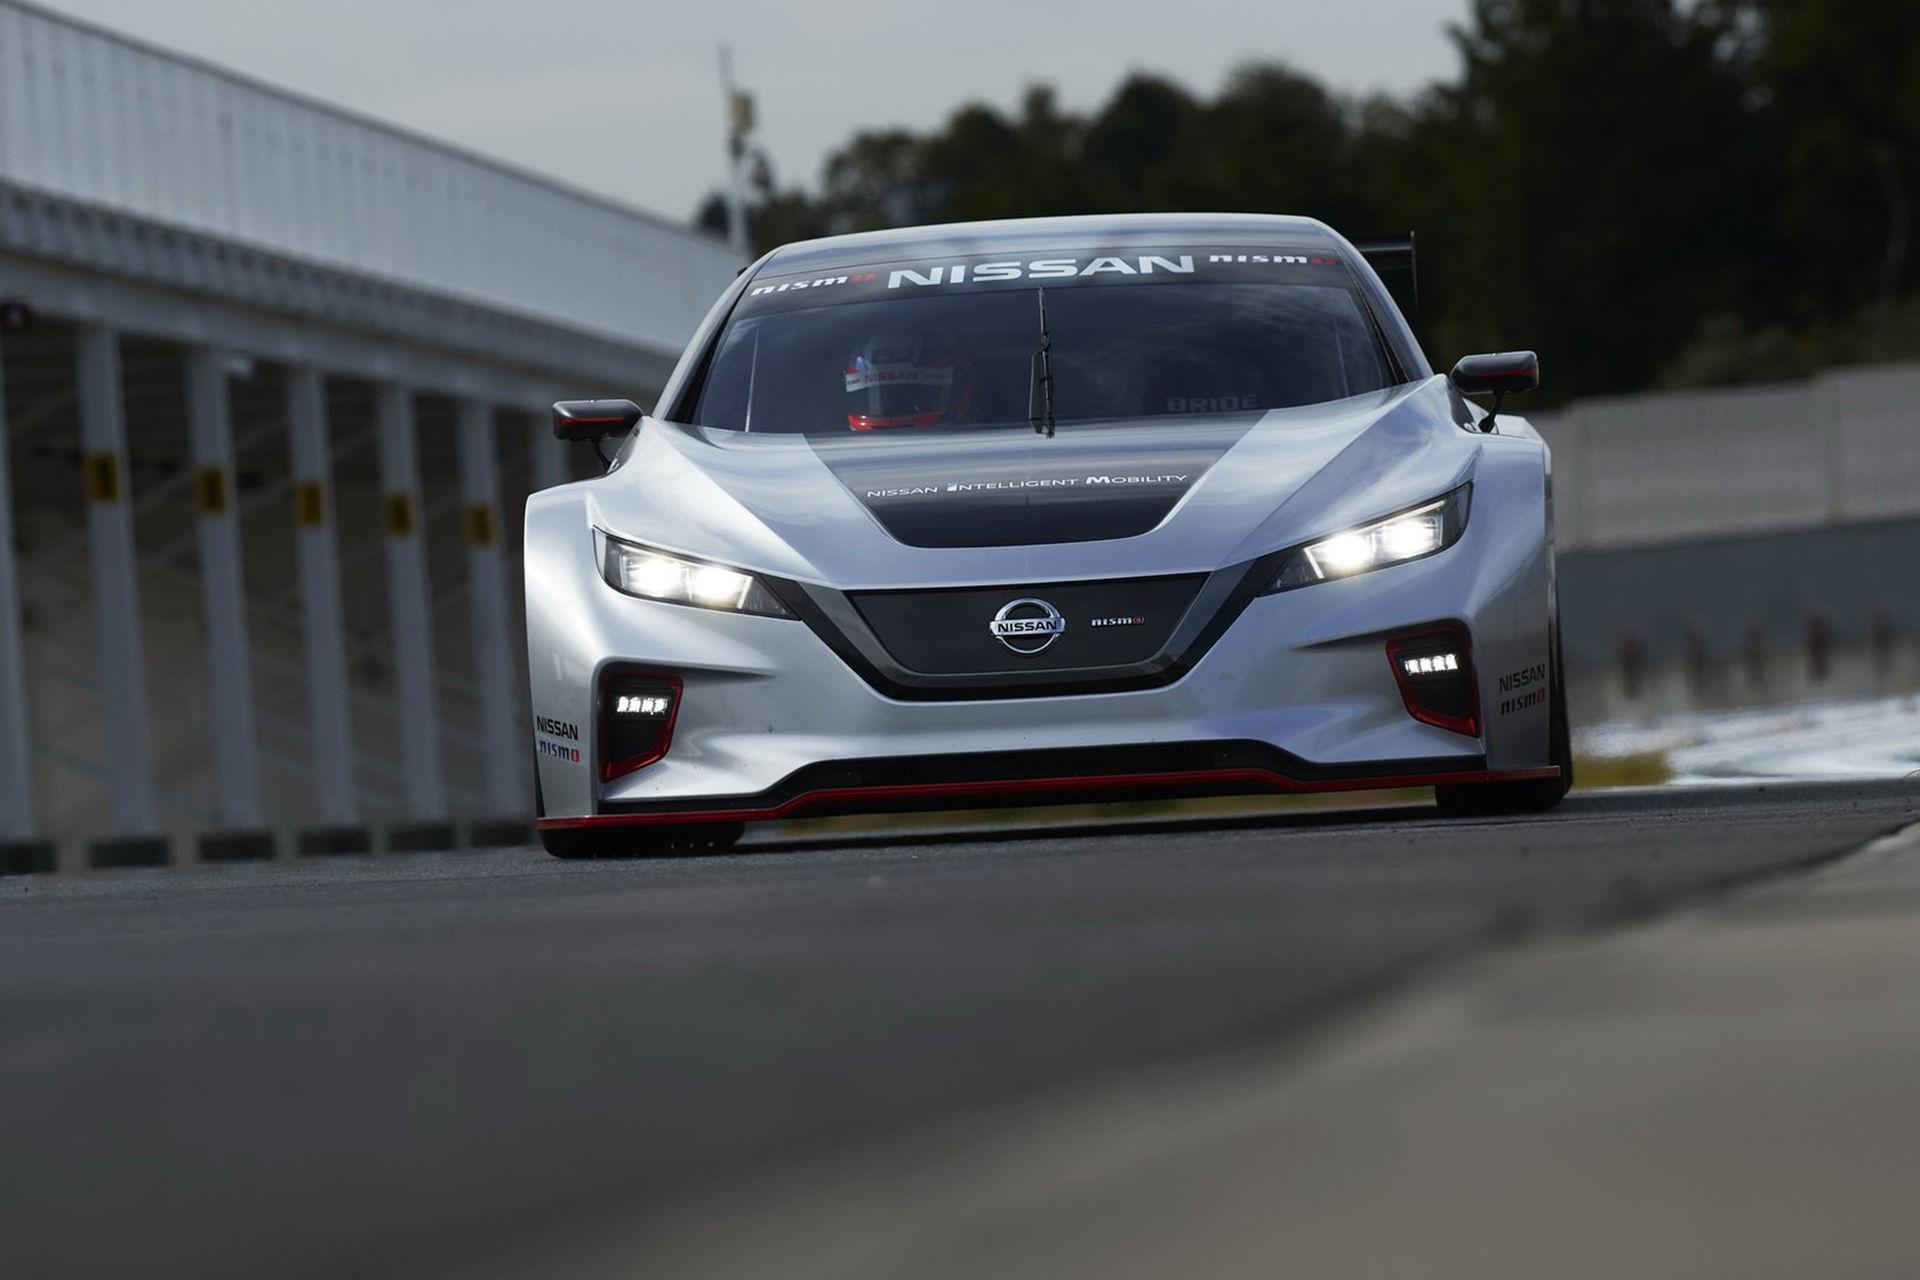 Nya Nissan Leaf som racerbil